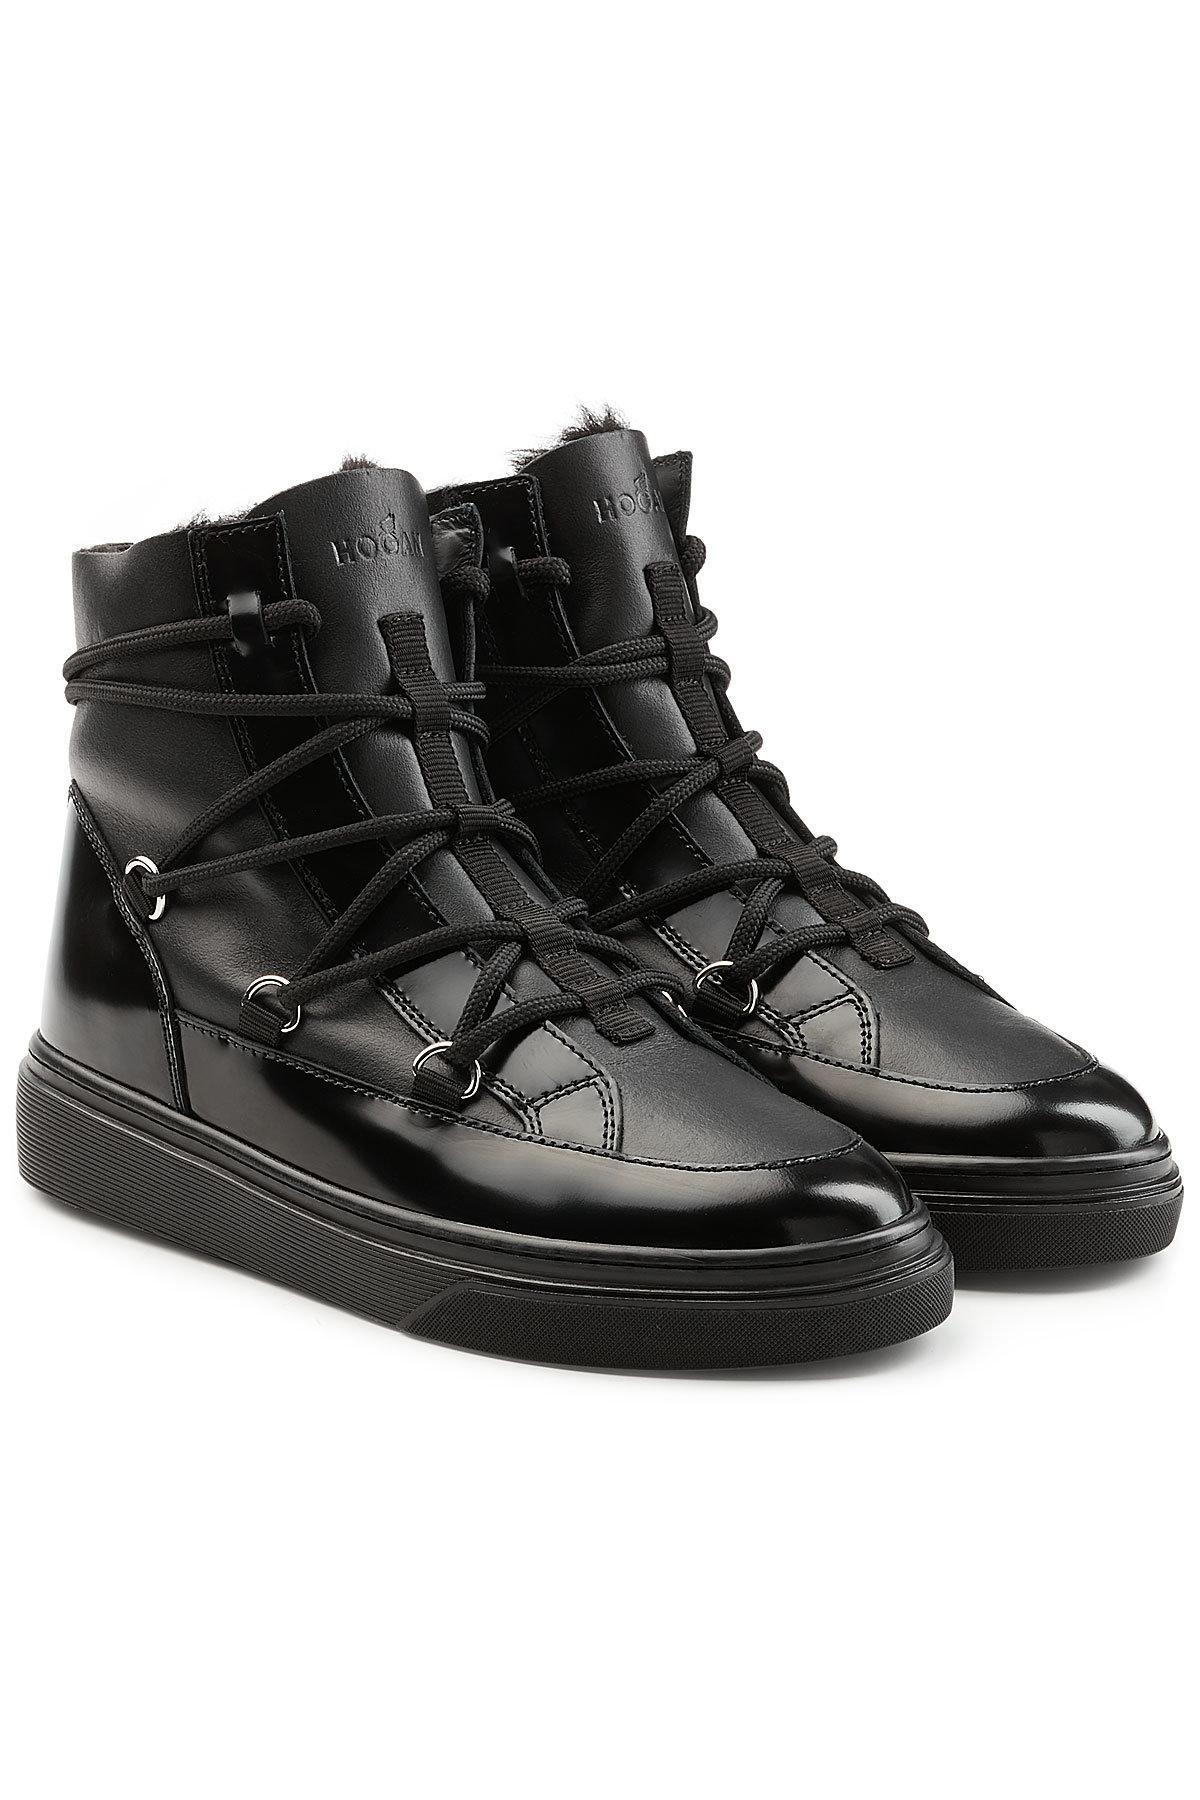 Hogan. Women's Black Platform Ankle Boots ...